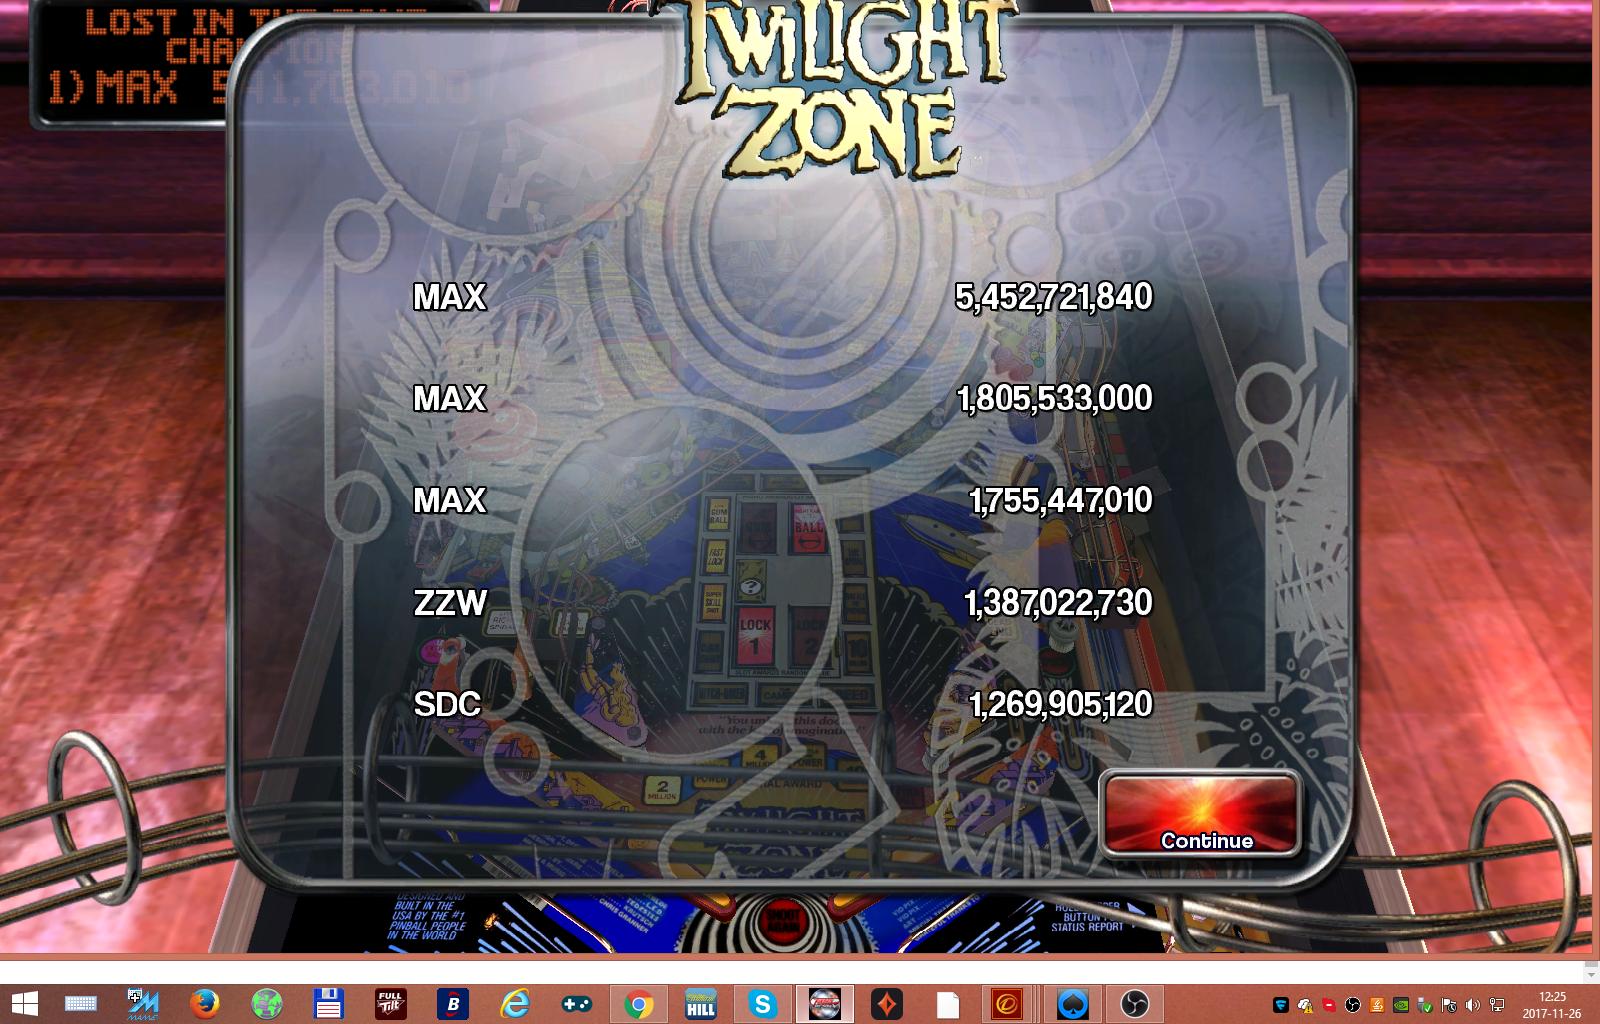 maxgreat: Pinball Arcade: Twilight Zone (PC) 5,452,721,840 points on 2017-11-26 05:25:59